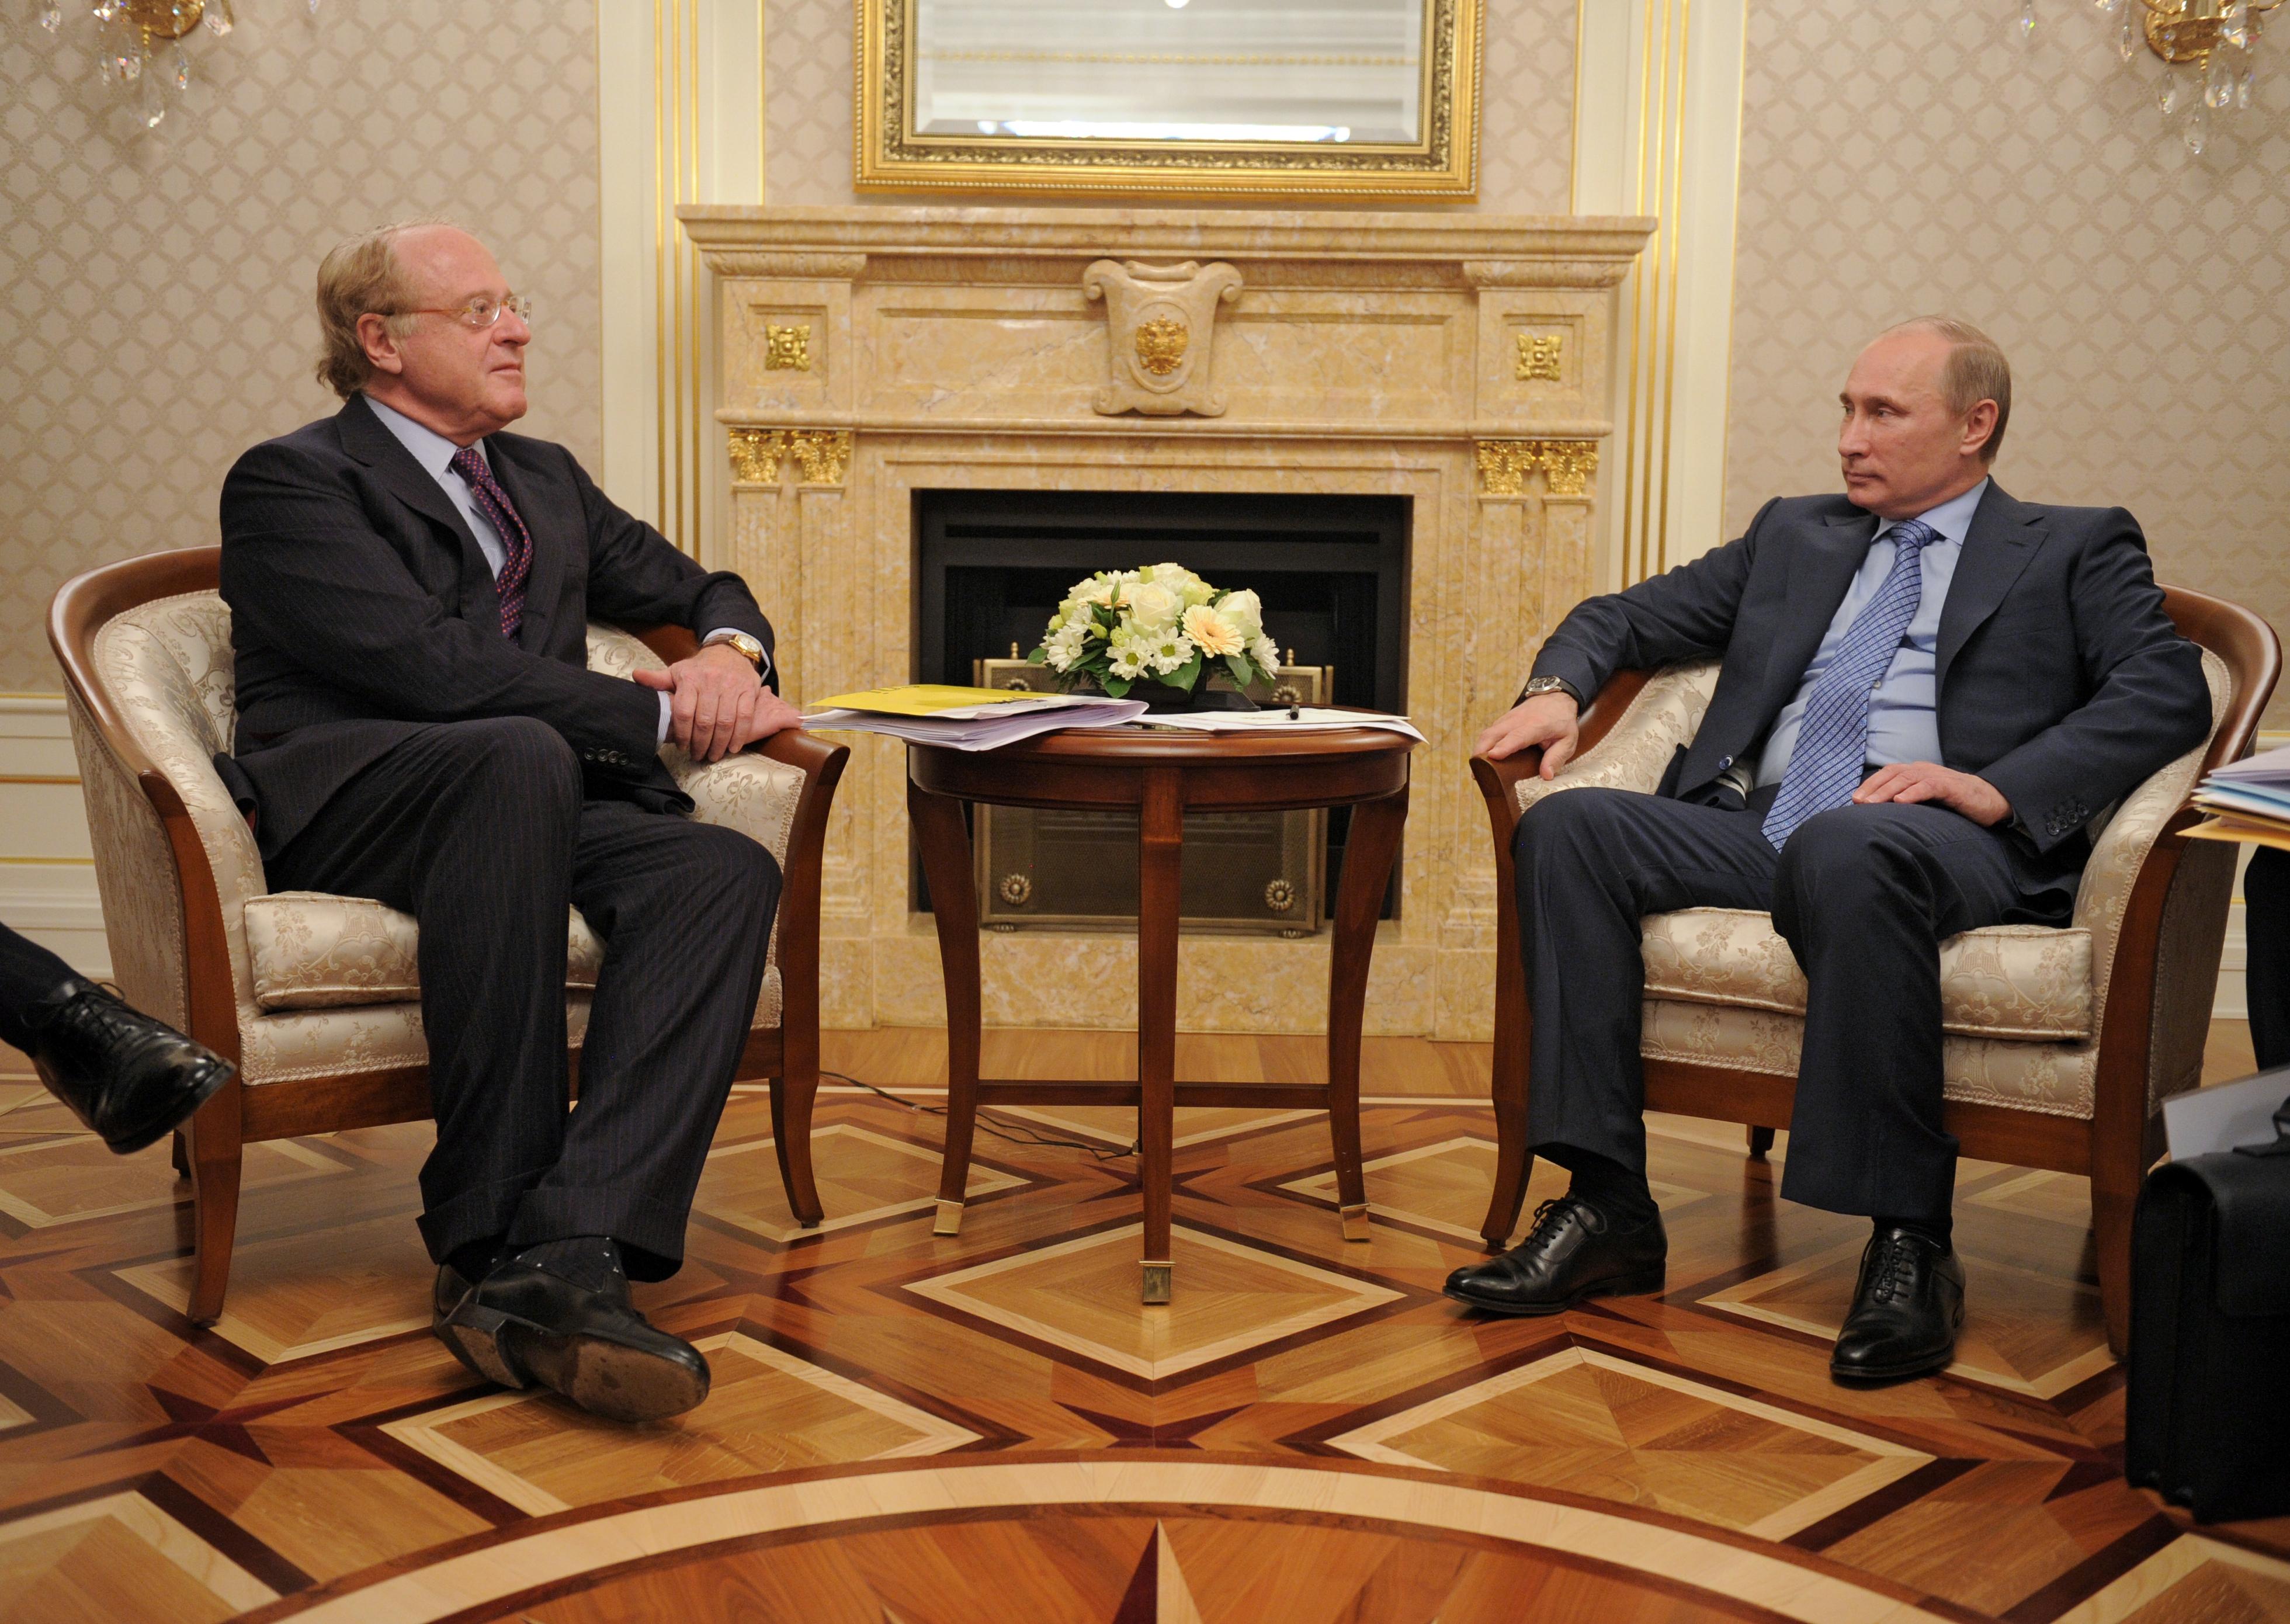 Filepaolo Scaroni And Vladimir Putin April   Jpeg